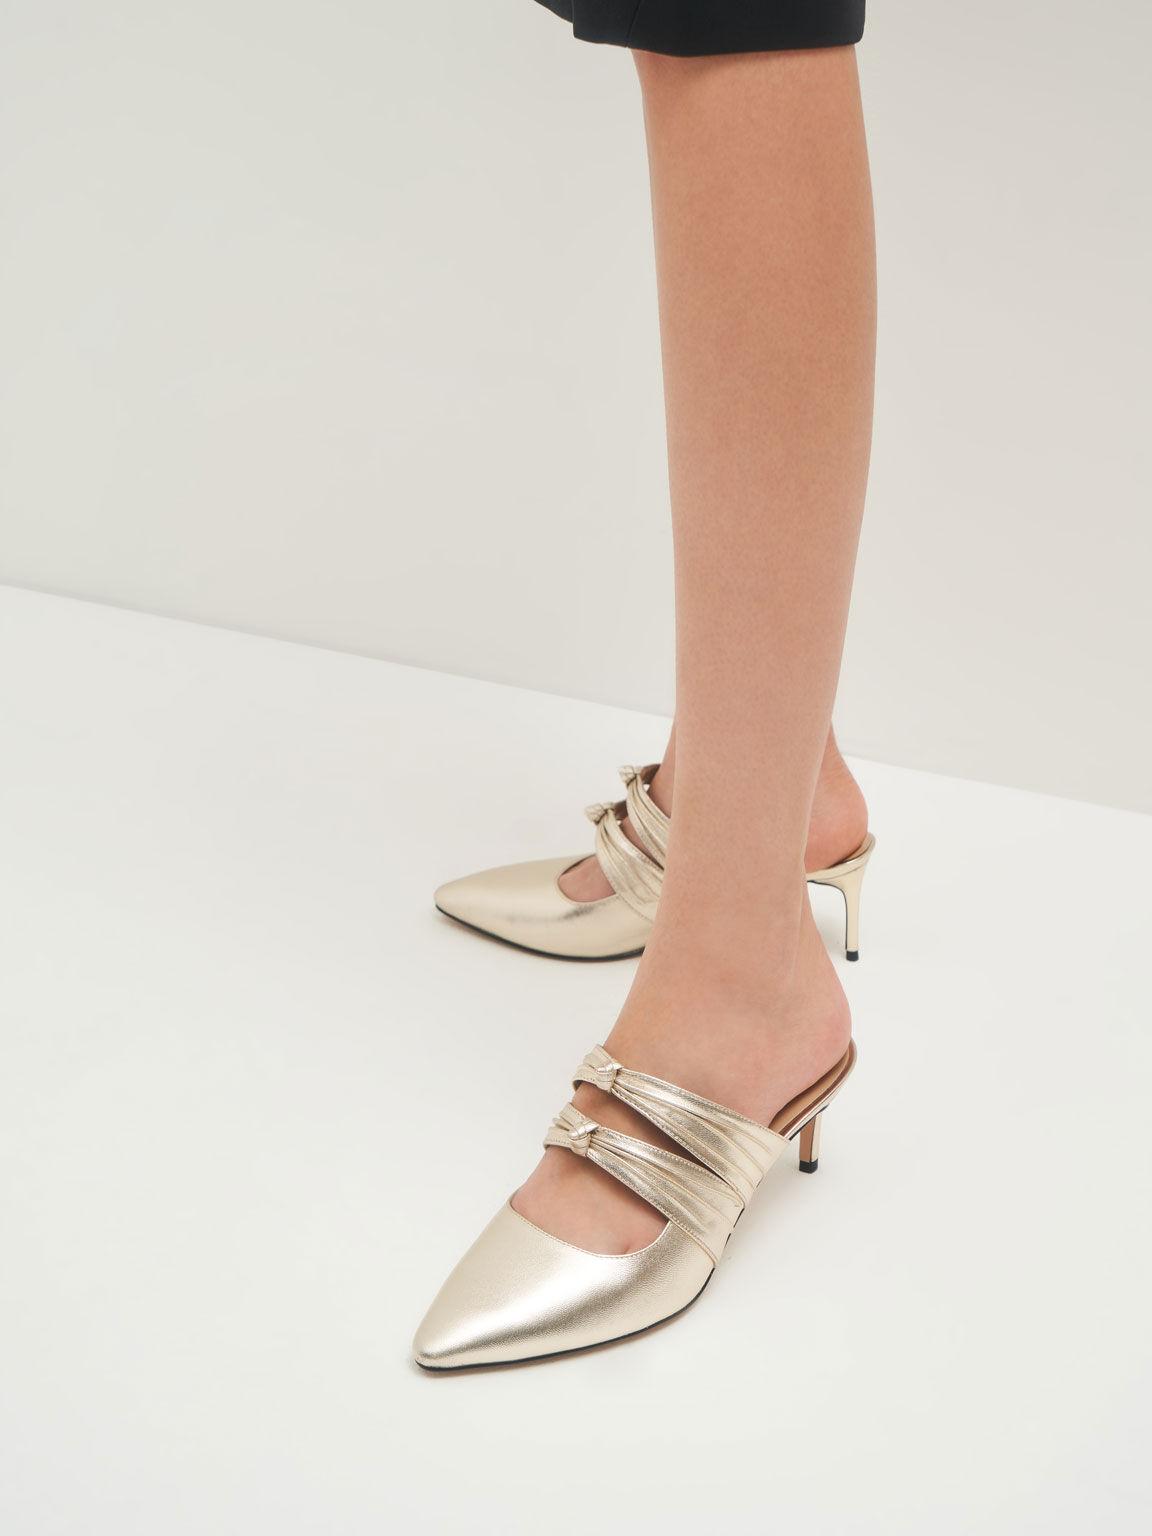 Knot Detail Metallic Heeled Mules (Kid Leather), Gold, hi-res